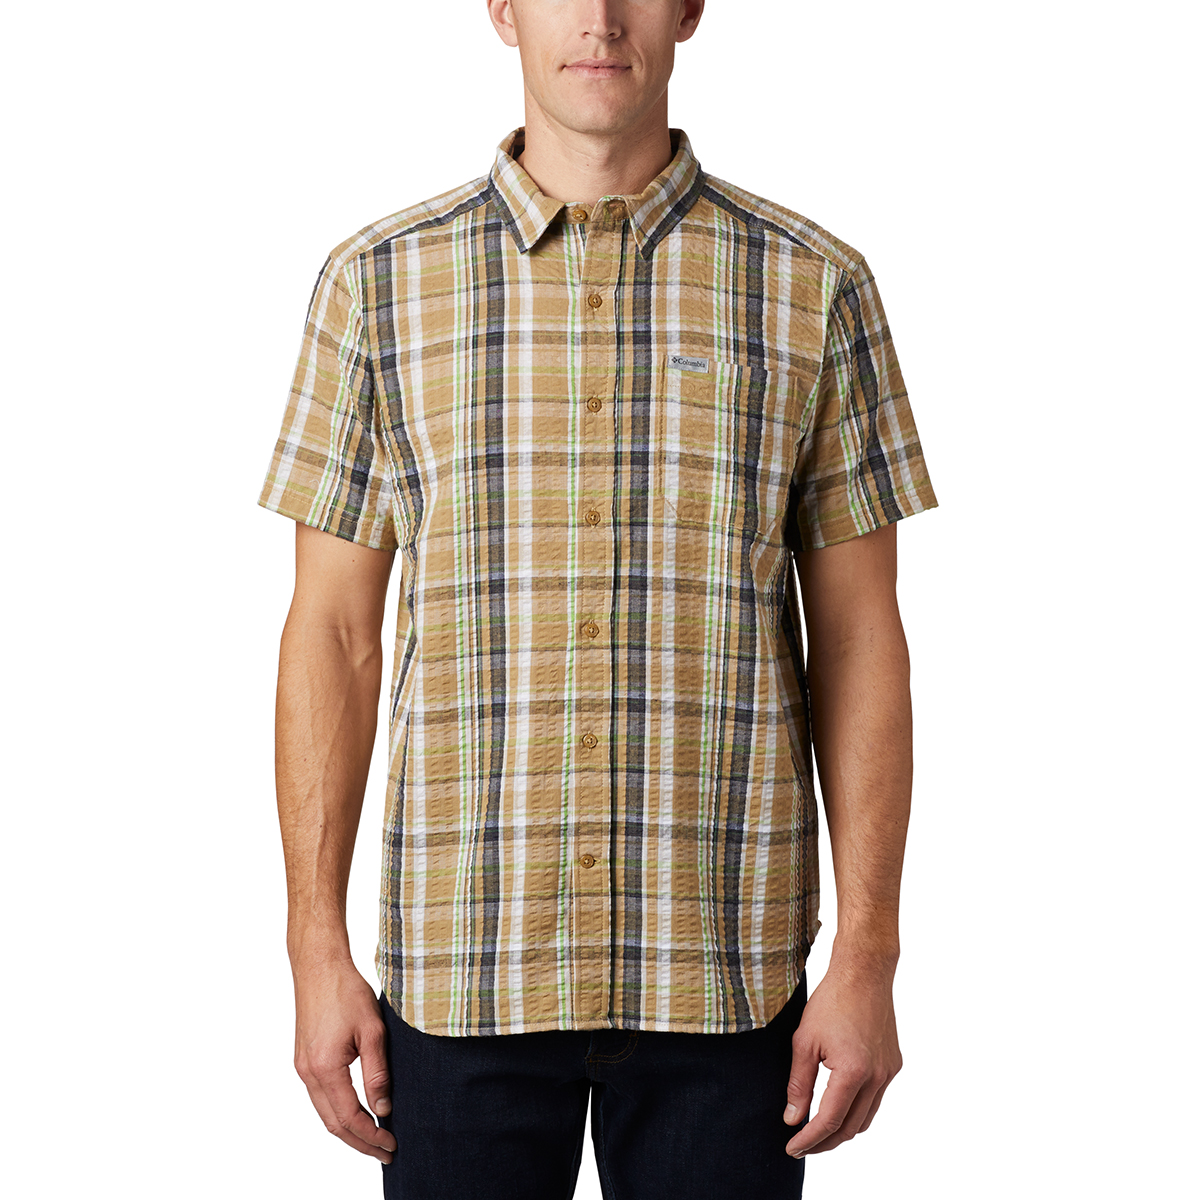 Columbia Men's Short-Sleeve Brentyn Trail Shirt - Brown, M